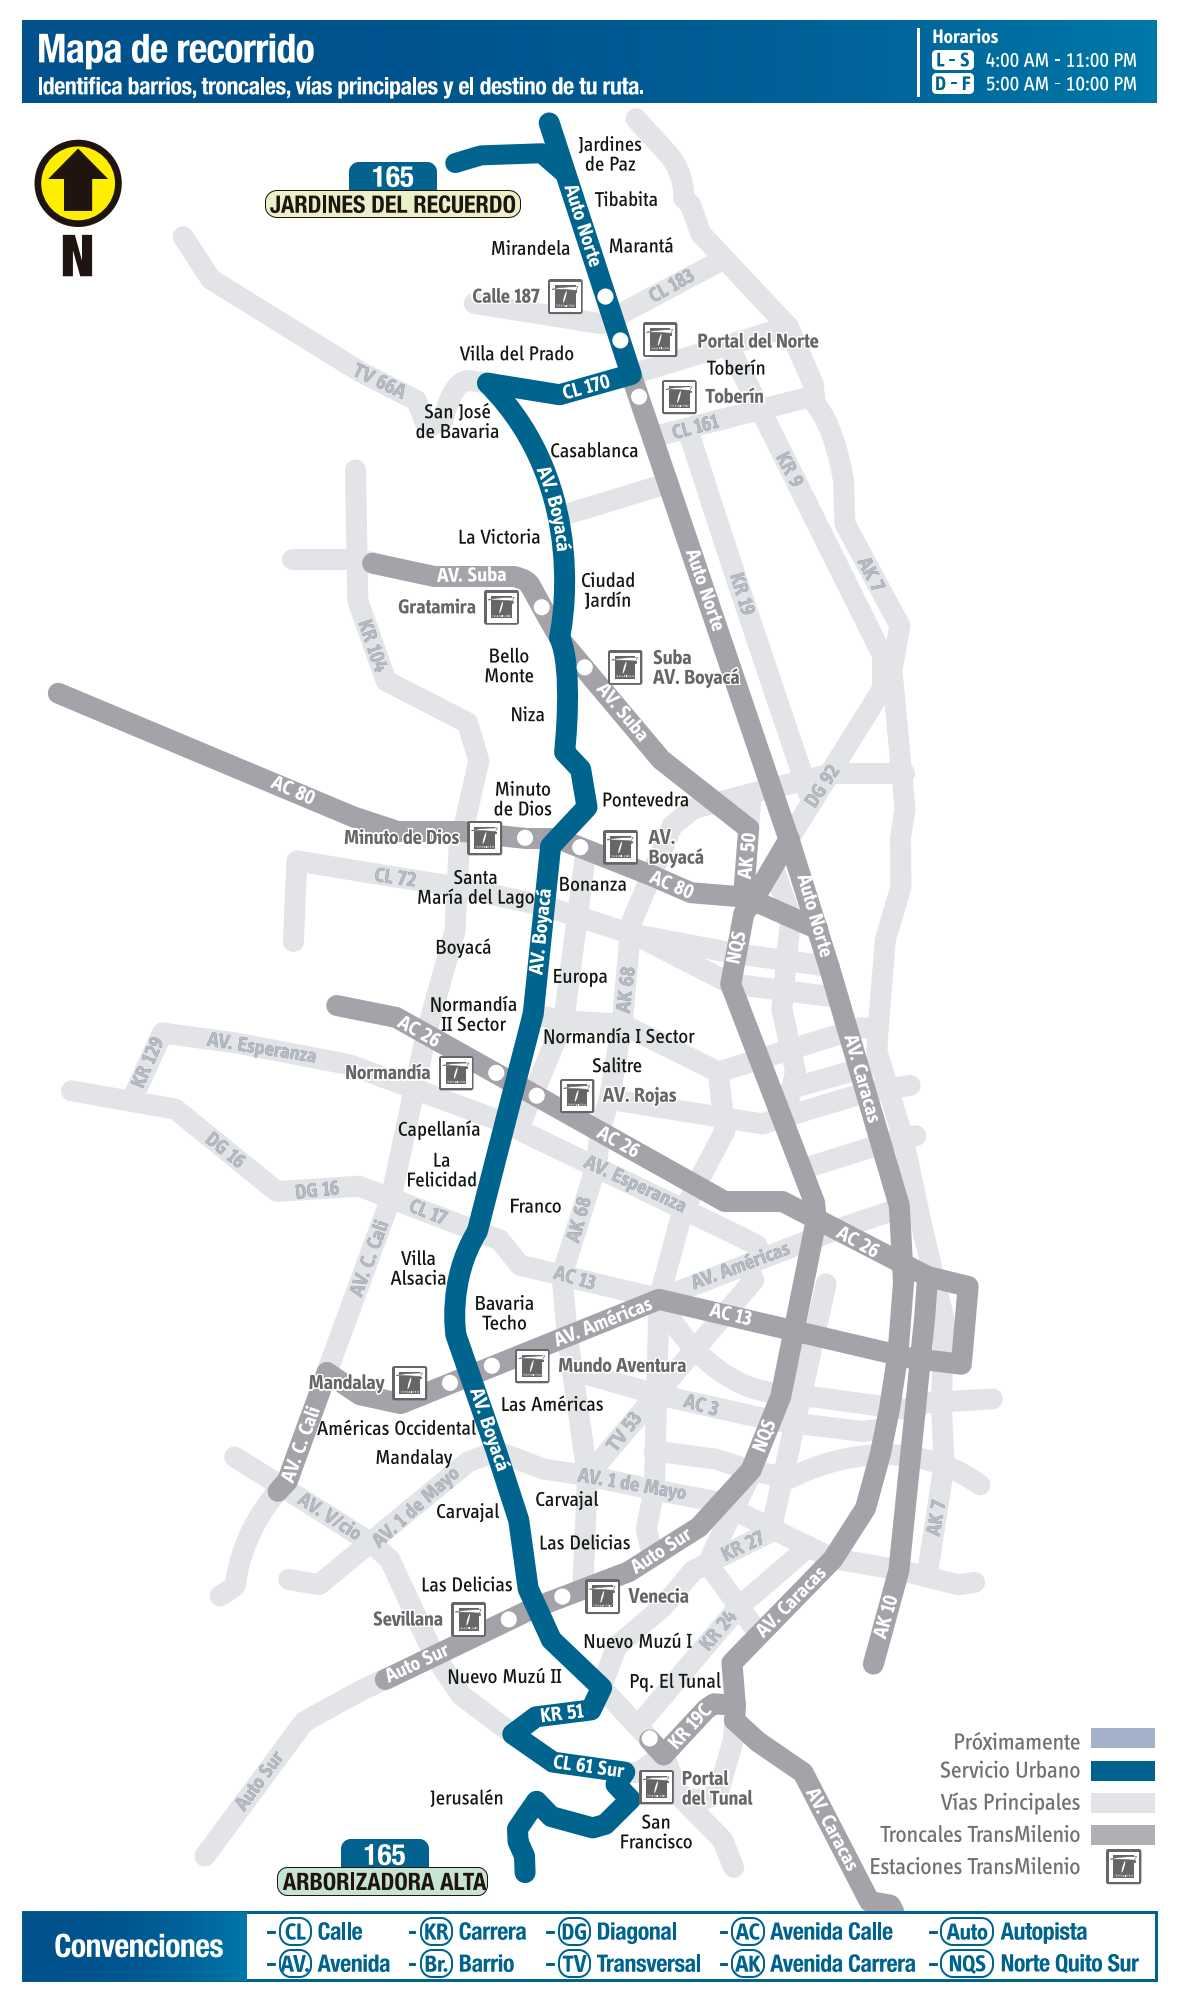 Ruta SITP: 165 Arborizadora Alta ↔ Jardines del Recuerdo (mapa)